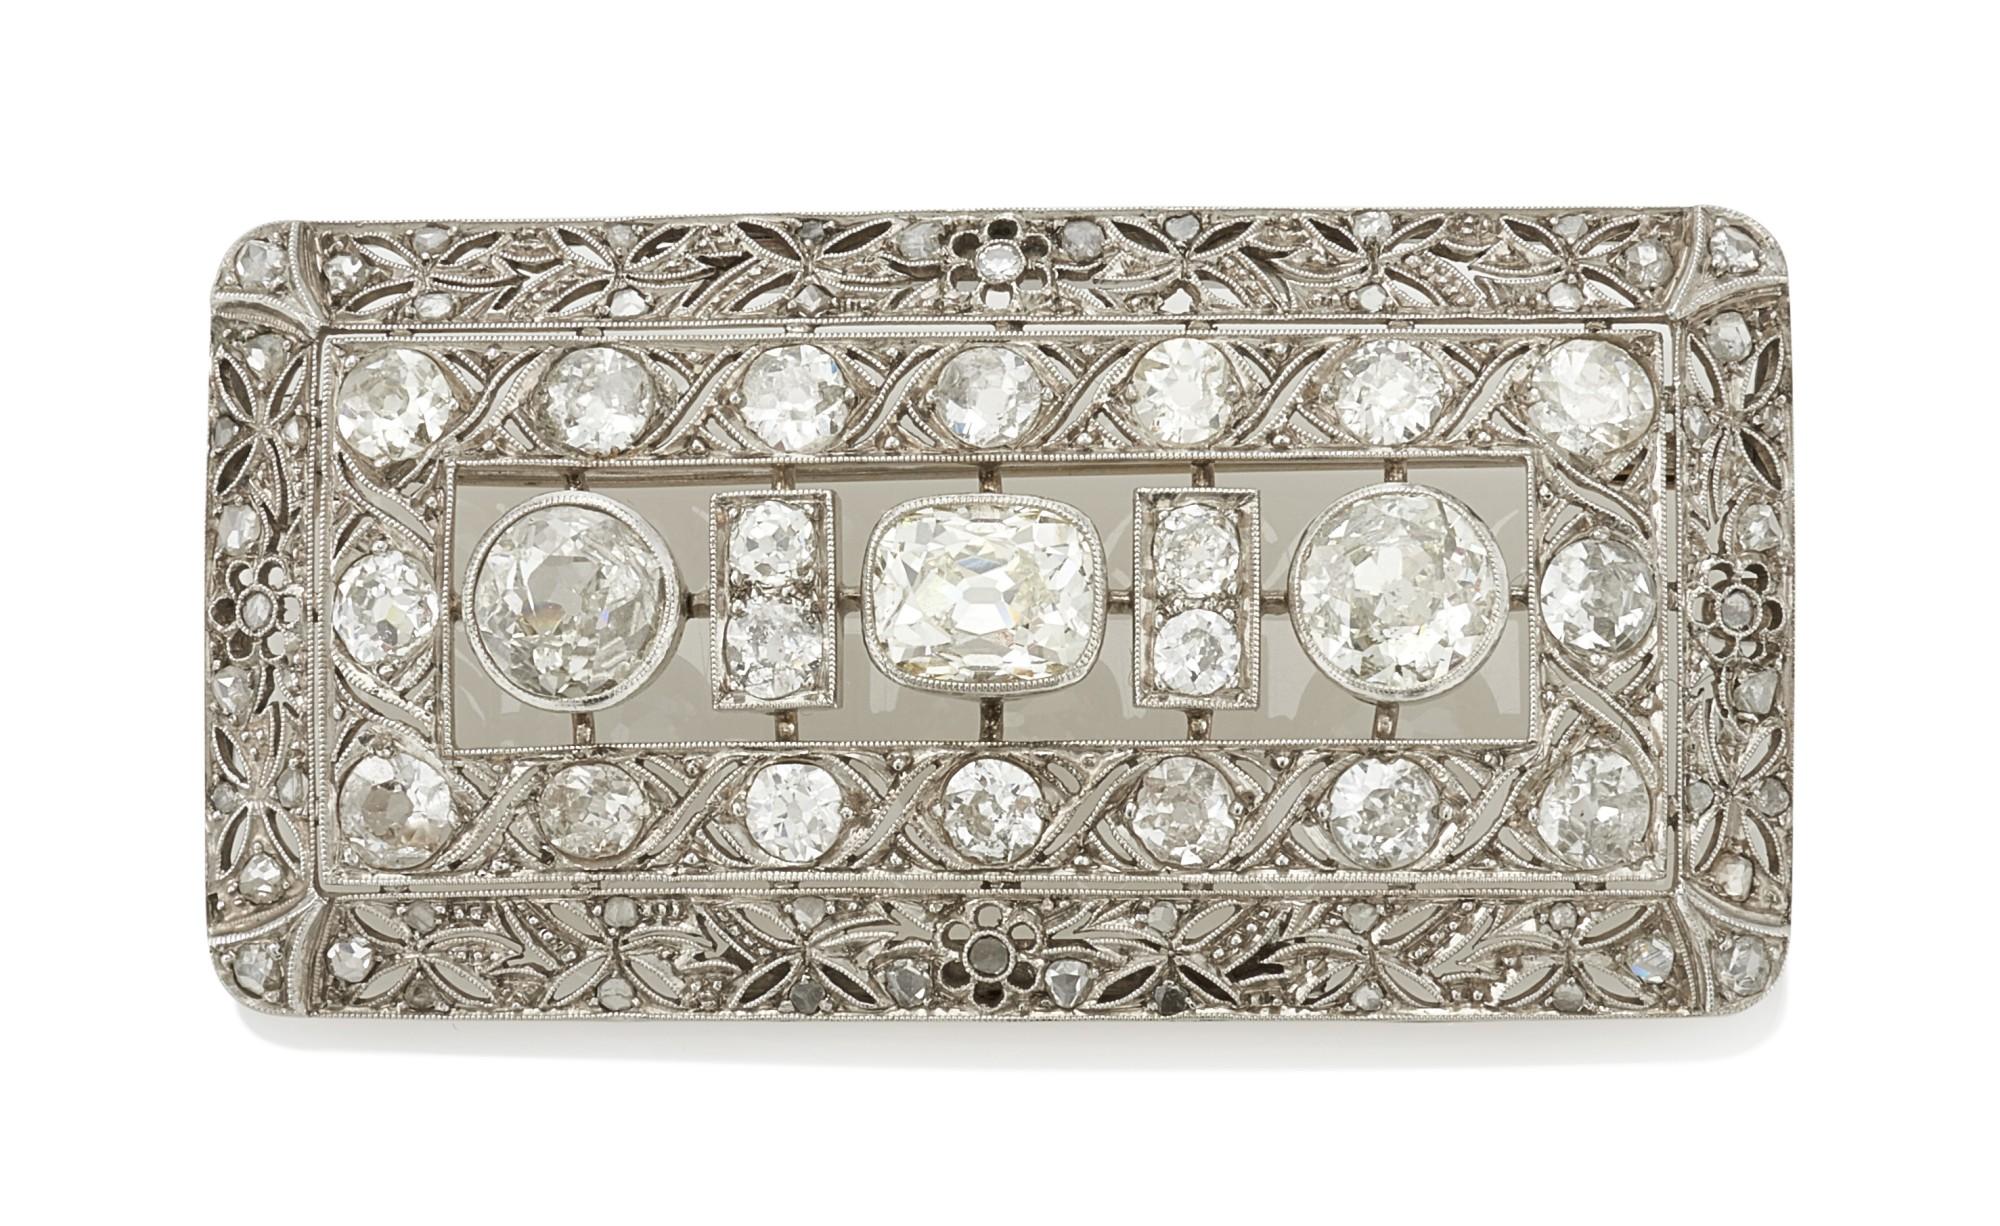 DIAMOND BROOCH (SPILLA IN DIAMANTI)